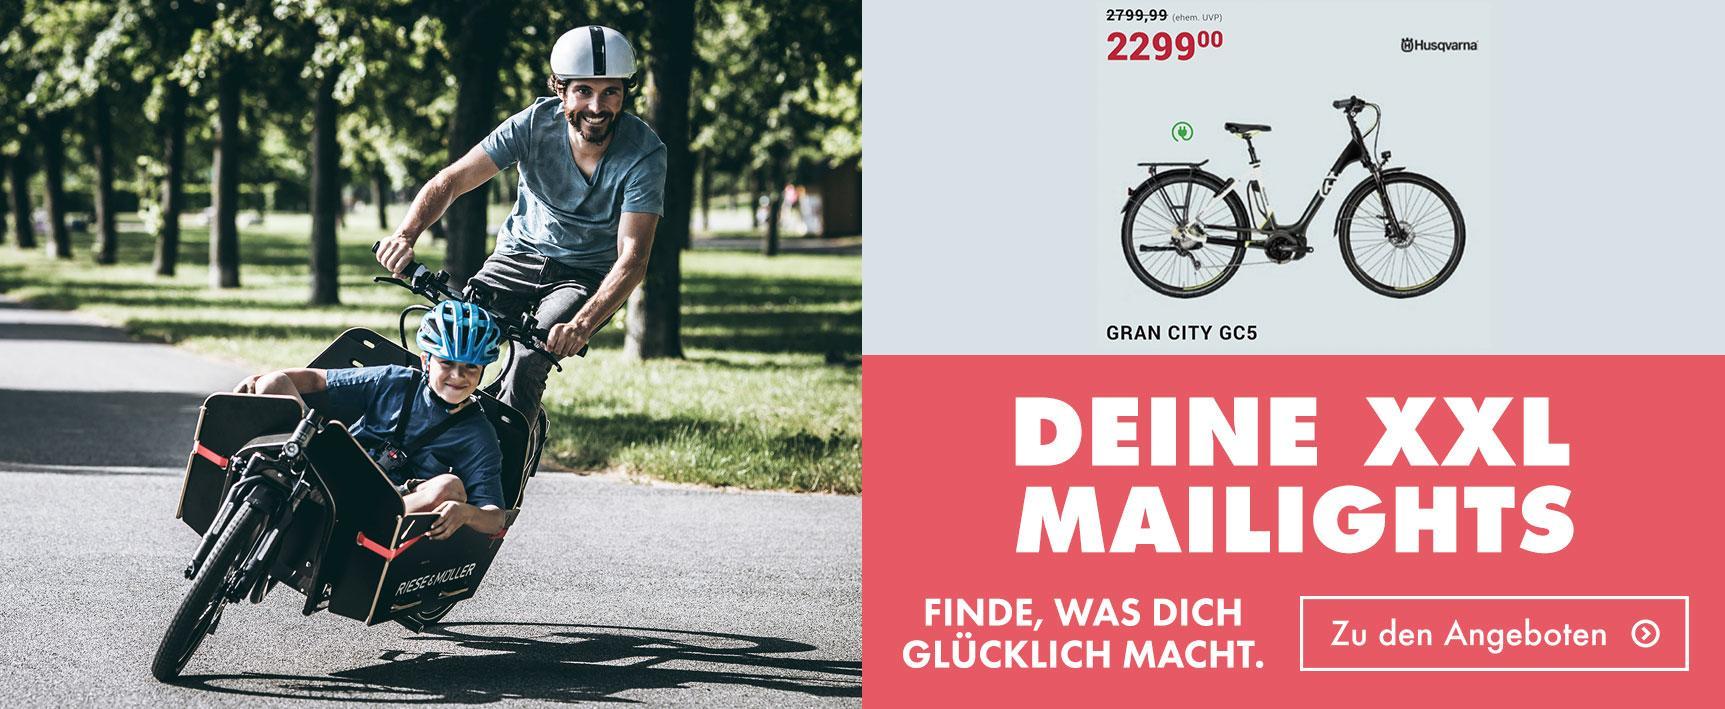 33a04a3434a2f6 Fahrrad XXL Meinhövel - dein Fahrradladen in Bochum